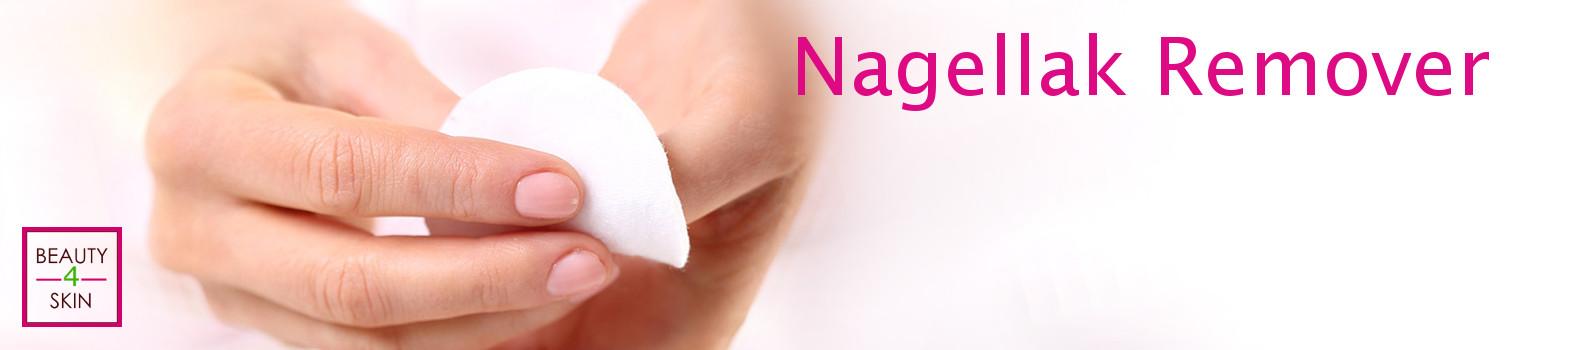 Nagellakremover